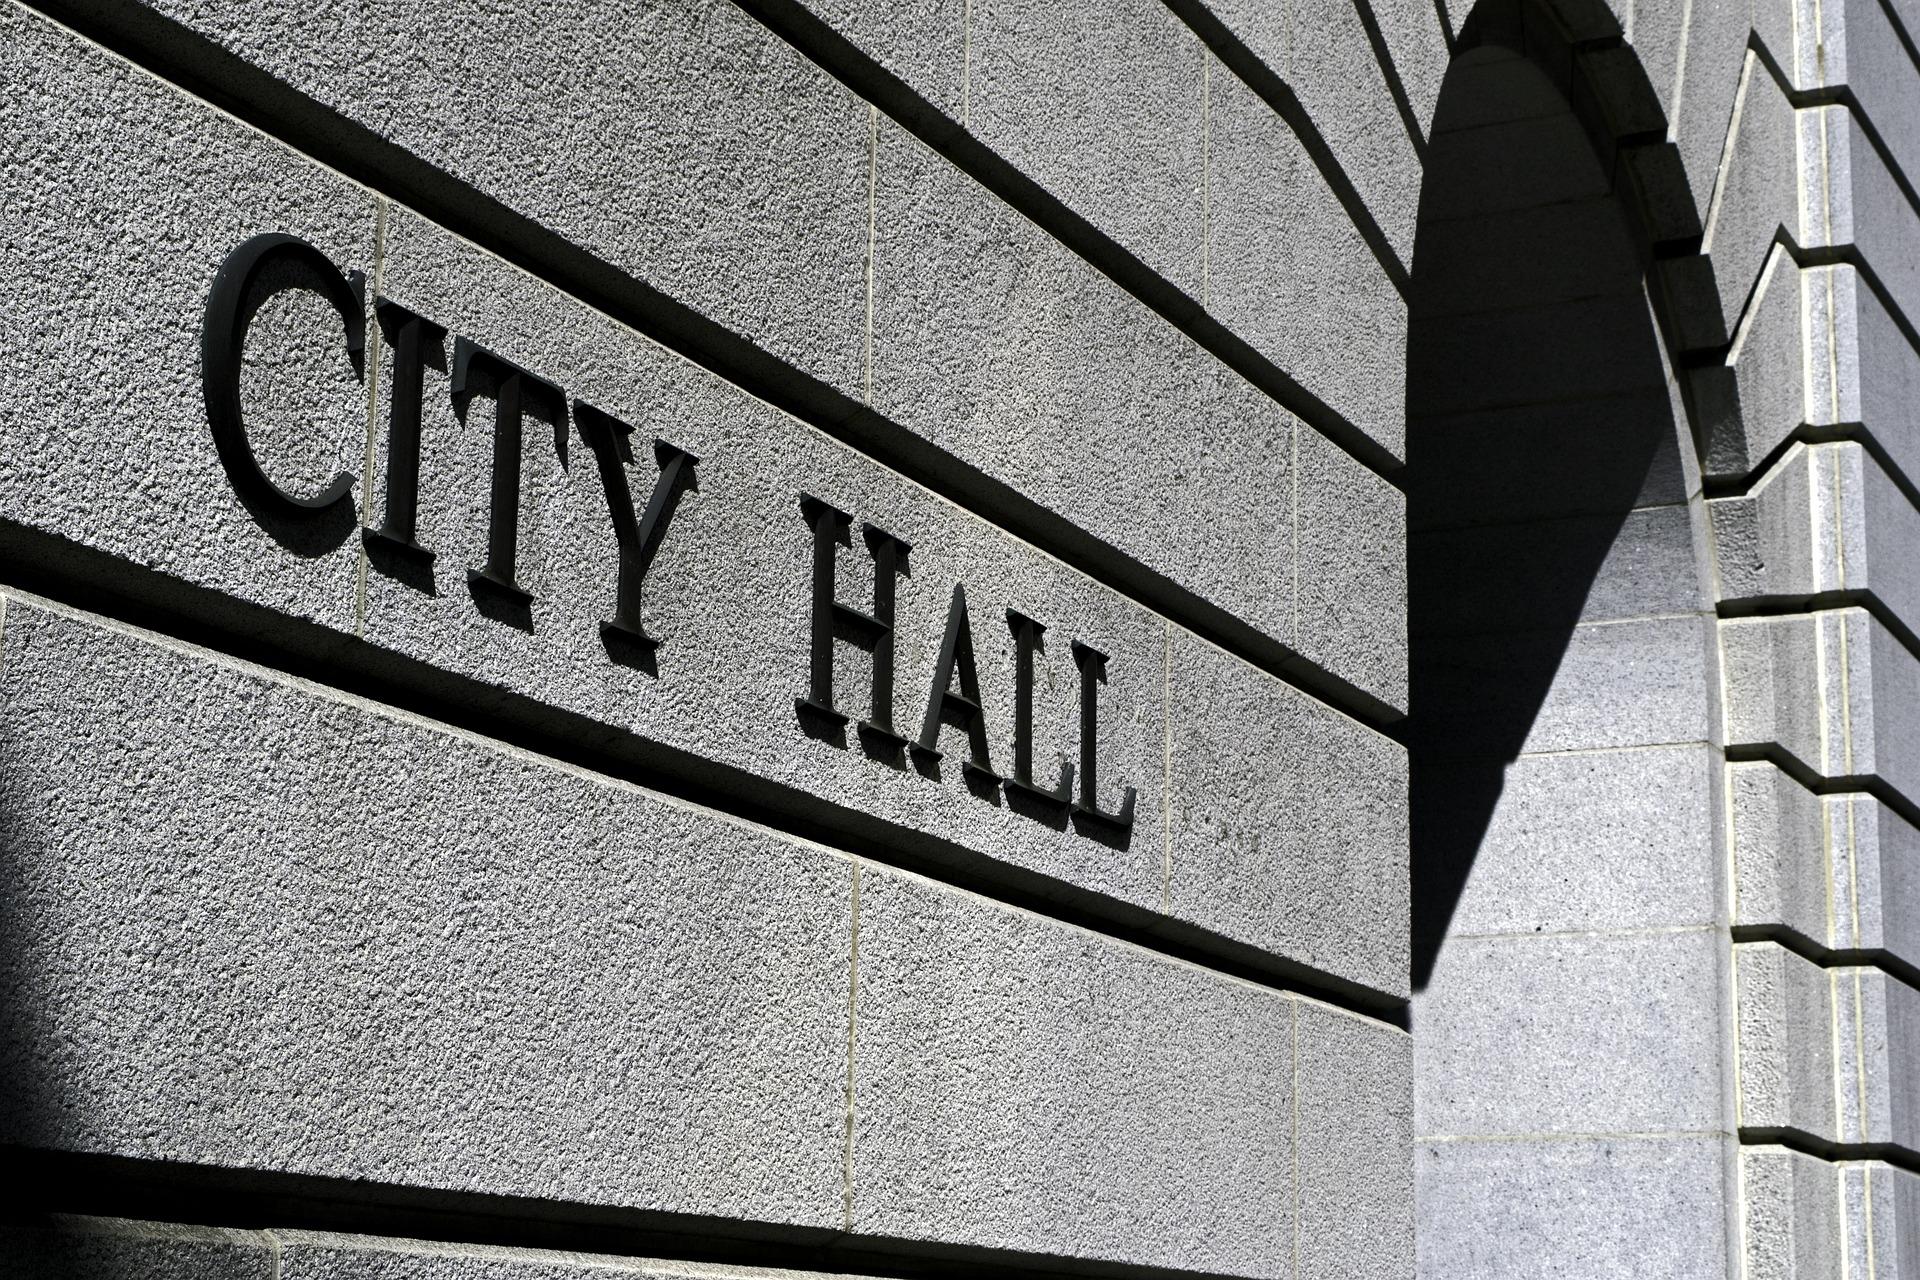 city-hall-719963_1920.jpg